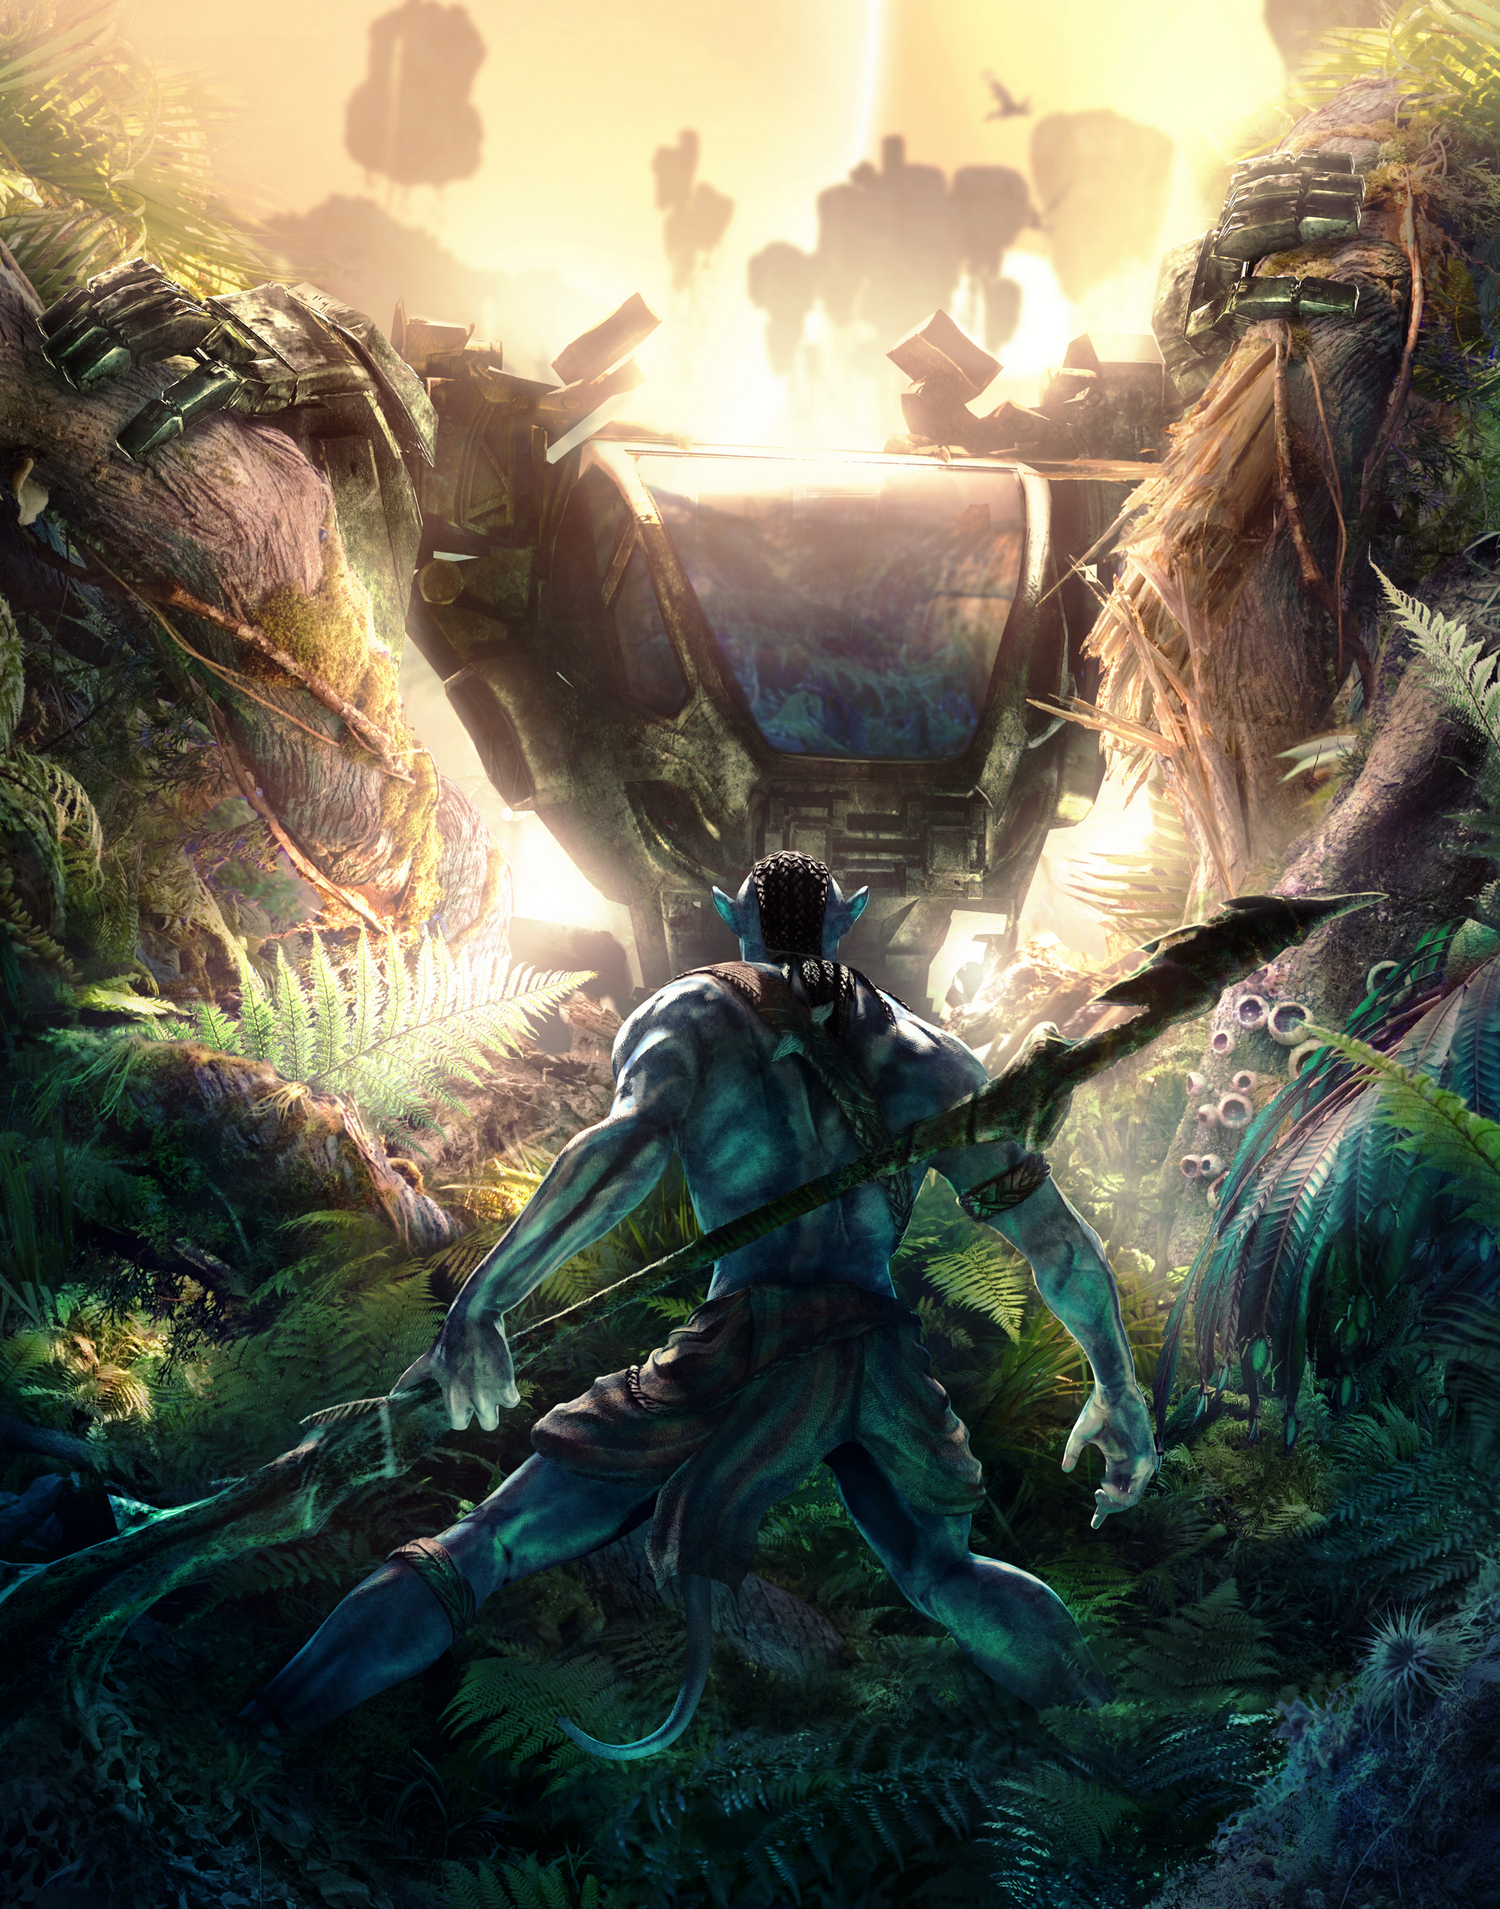 Арт к игре James Cameron's Avatar: The Game